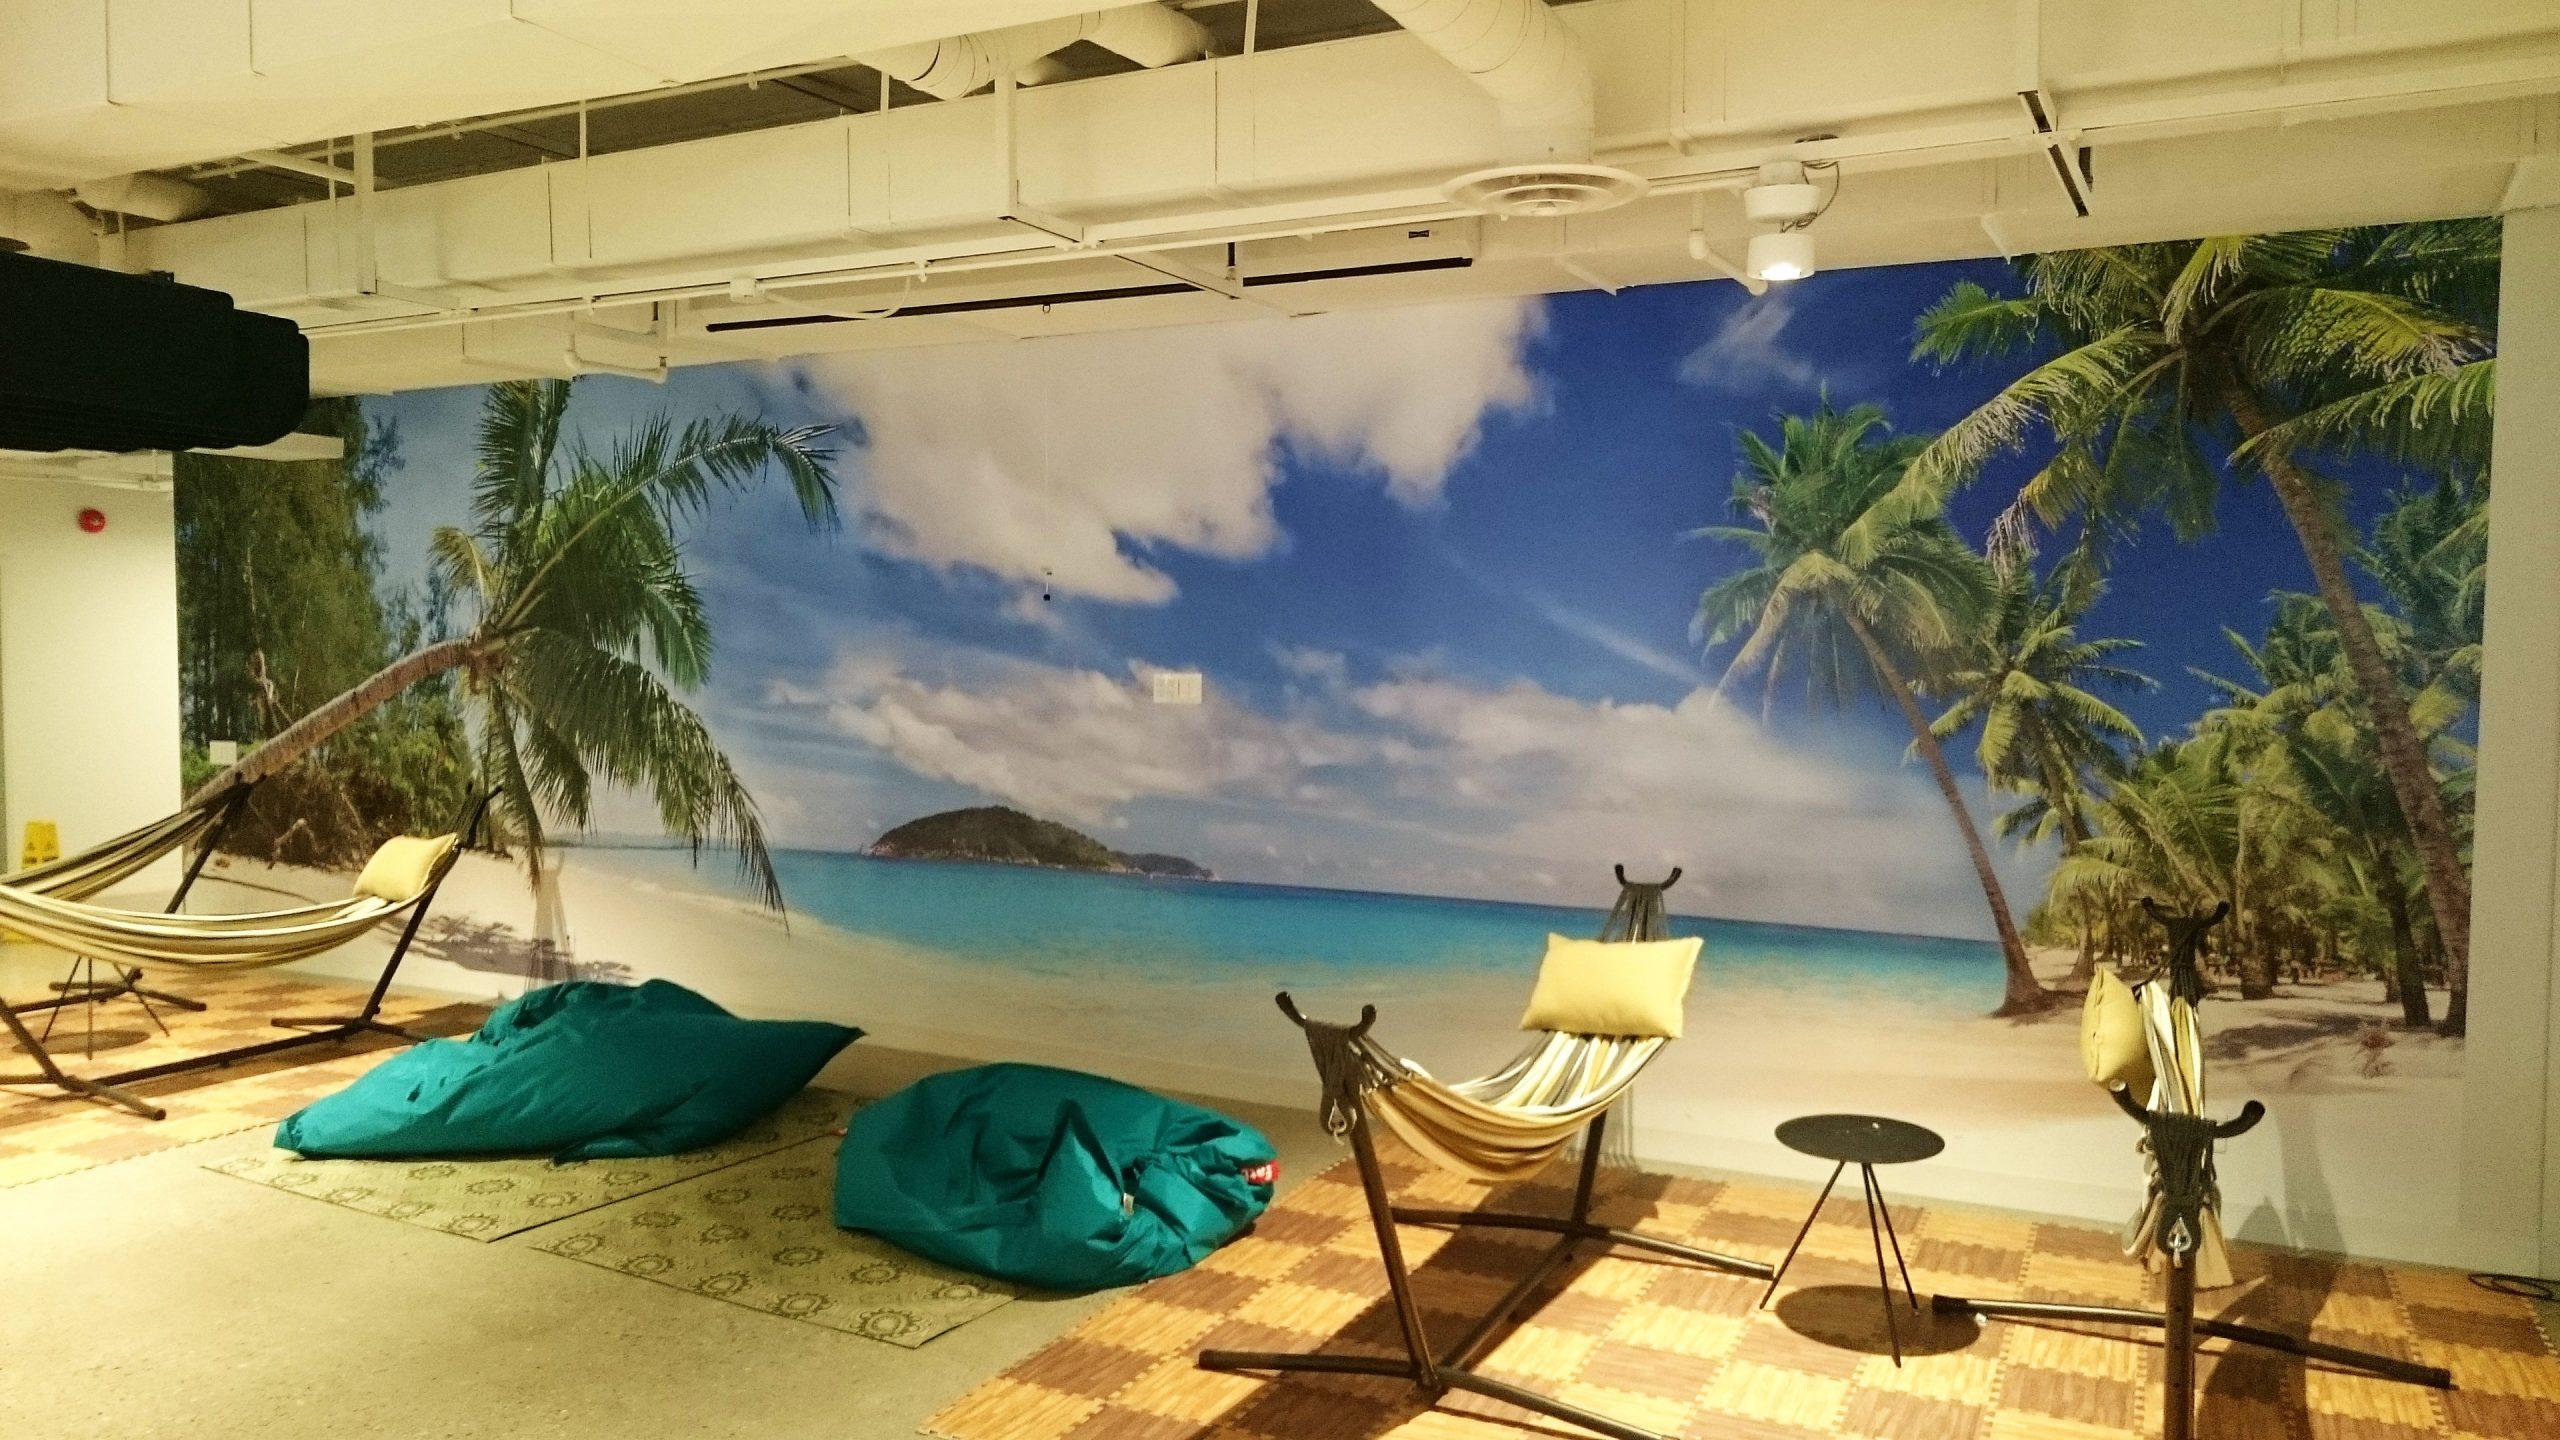 Wall Murals, Wall Graphics or Wallpaper?